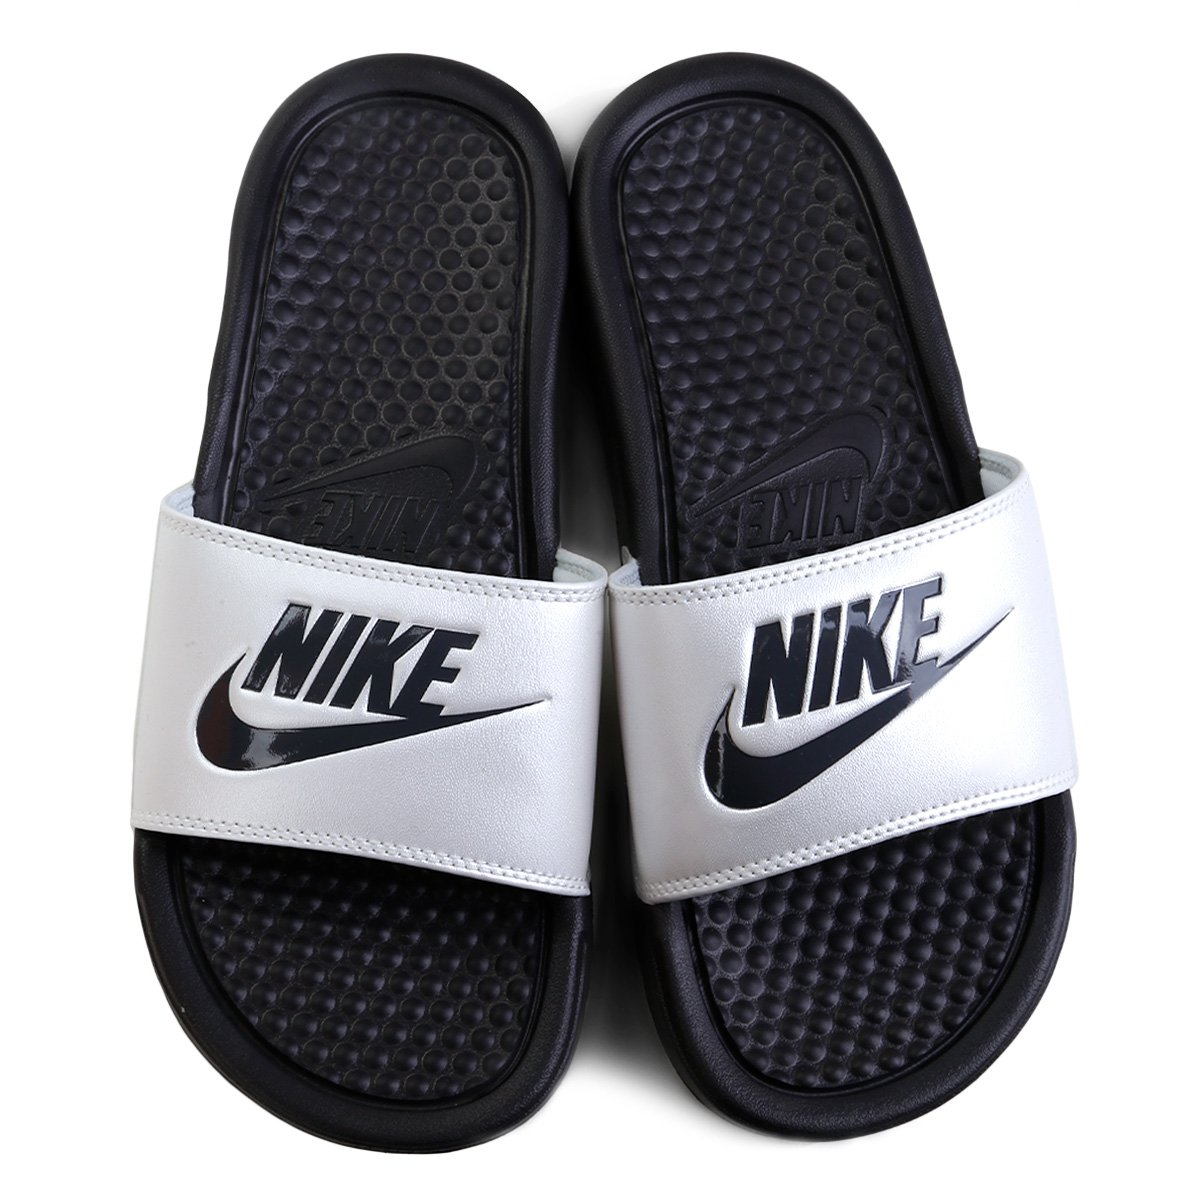 Chinelo Nike Benassi Jdi Slide Feminino Preto E Cinza